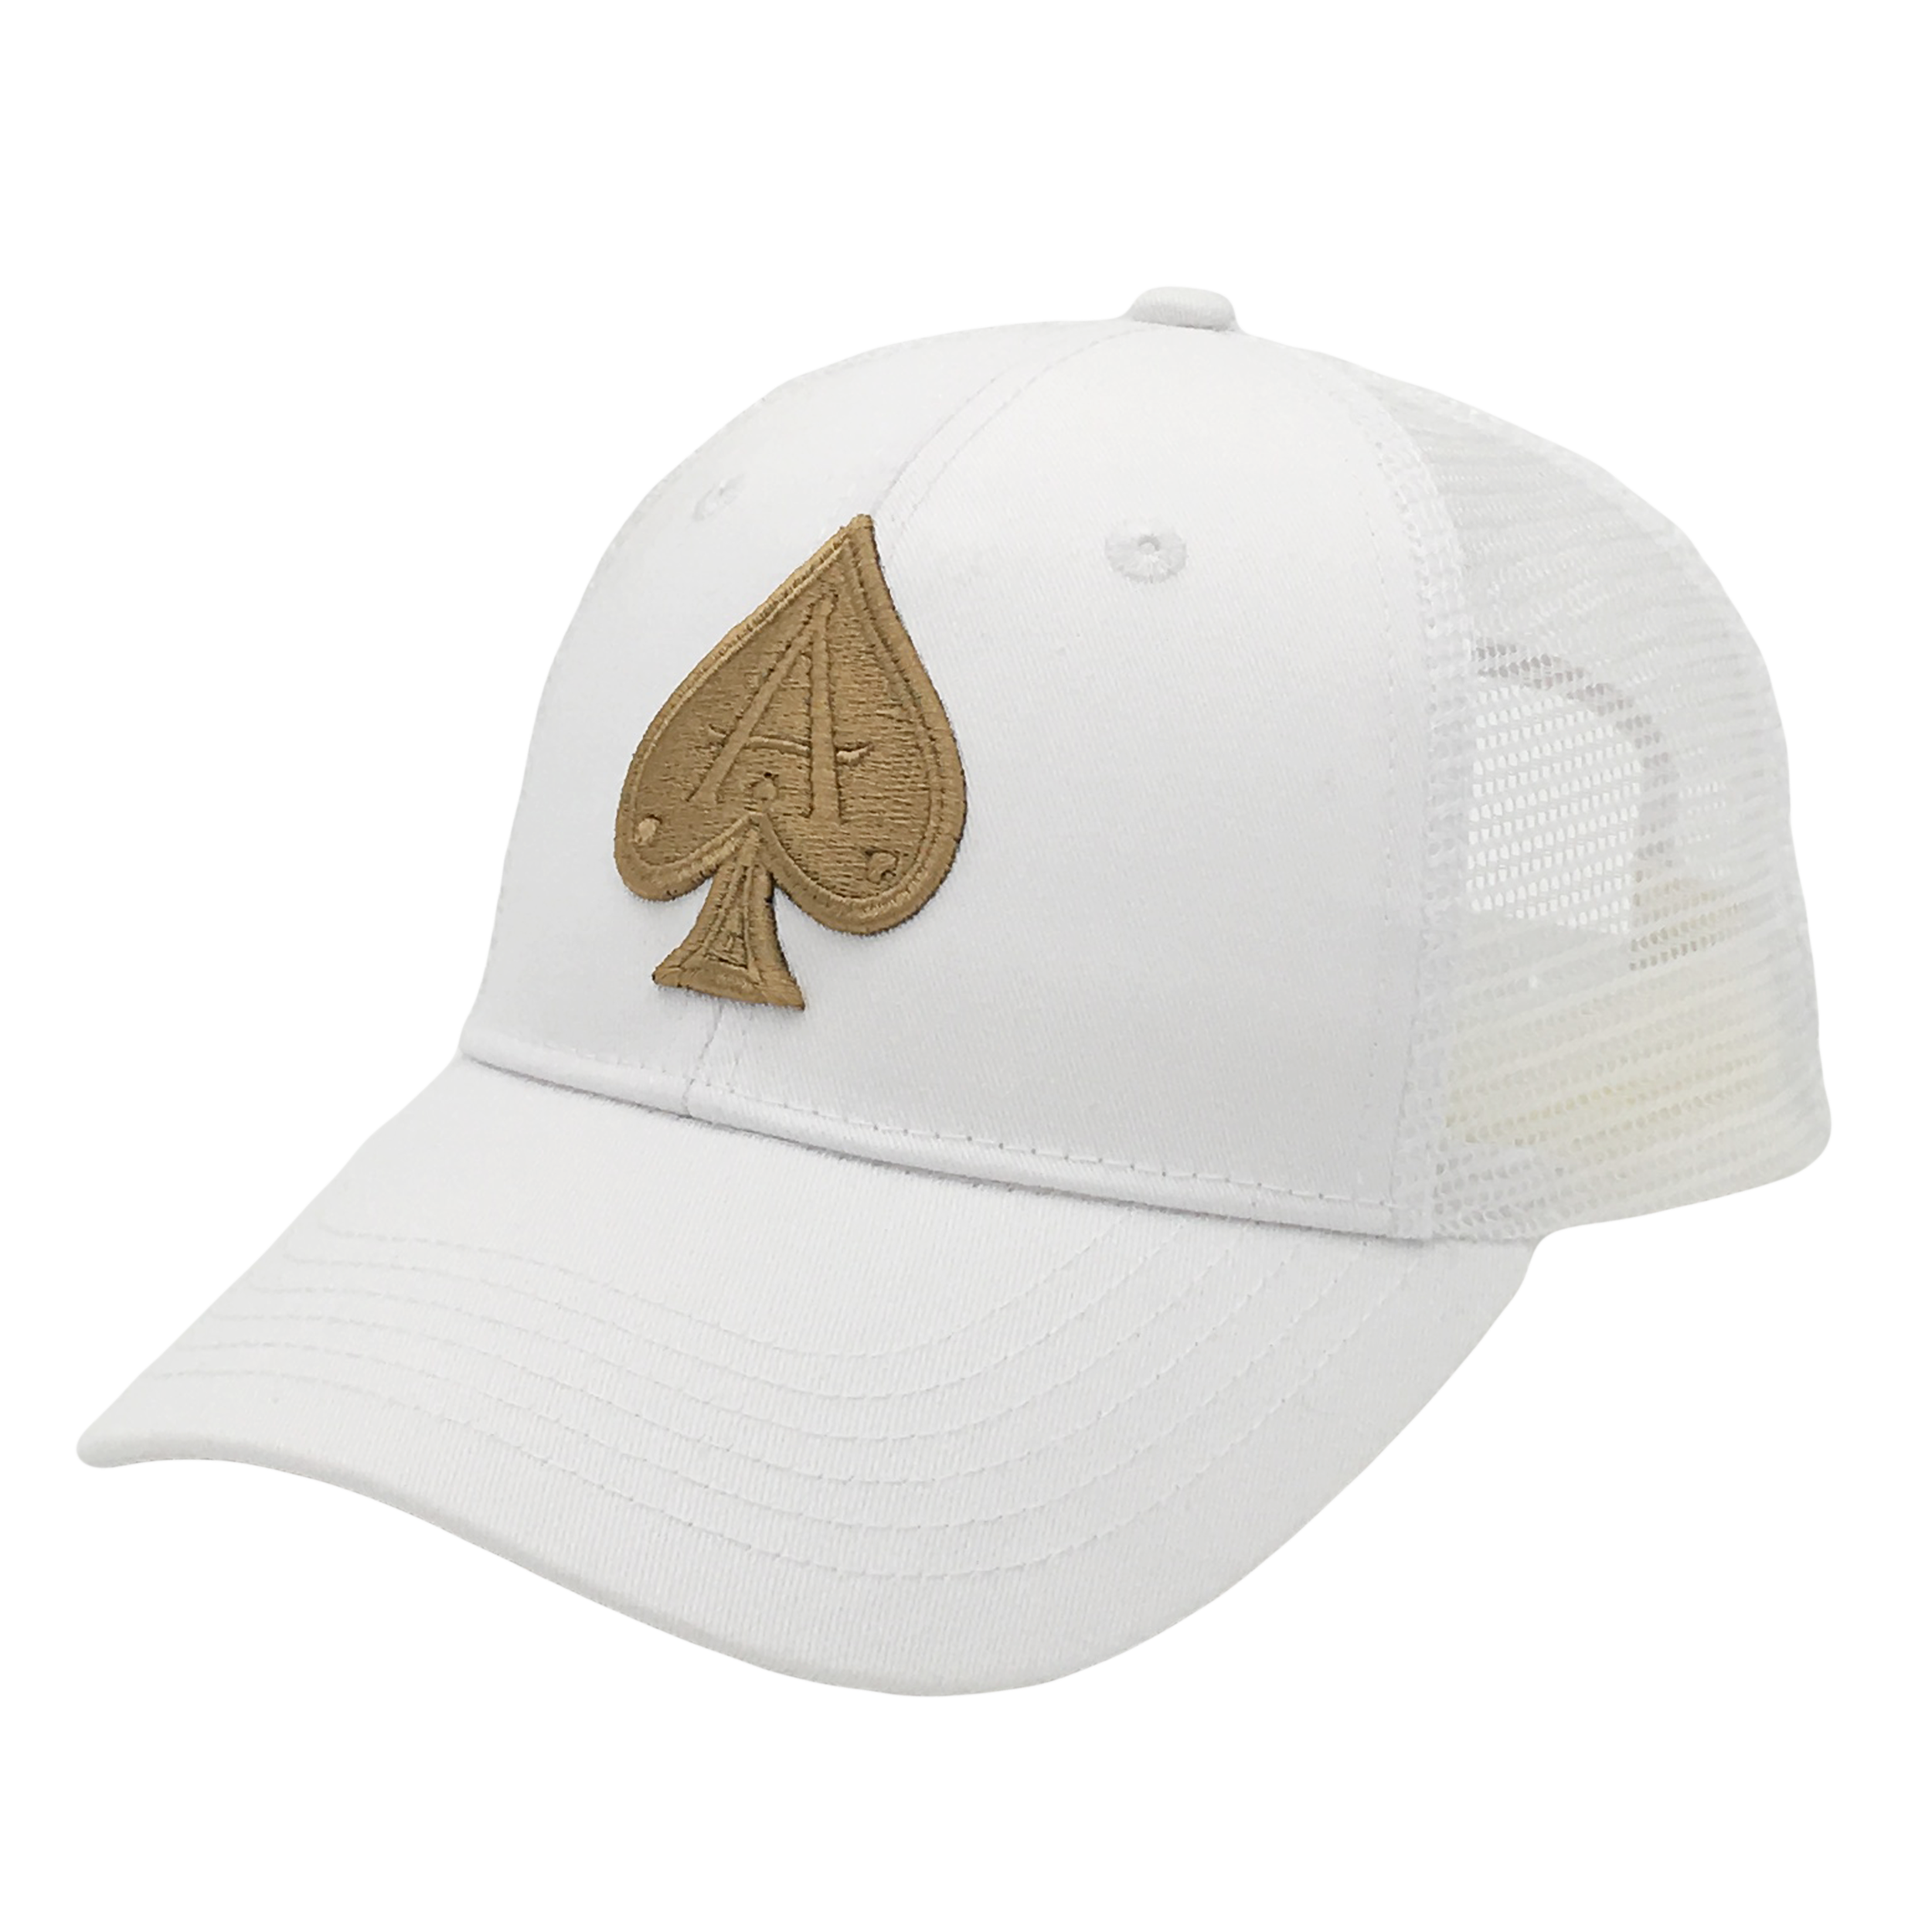 Premium Custom 3D embroidery Trucker Cap